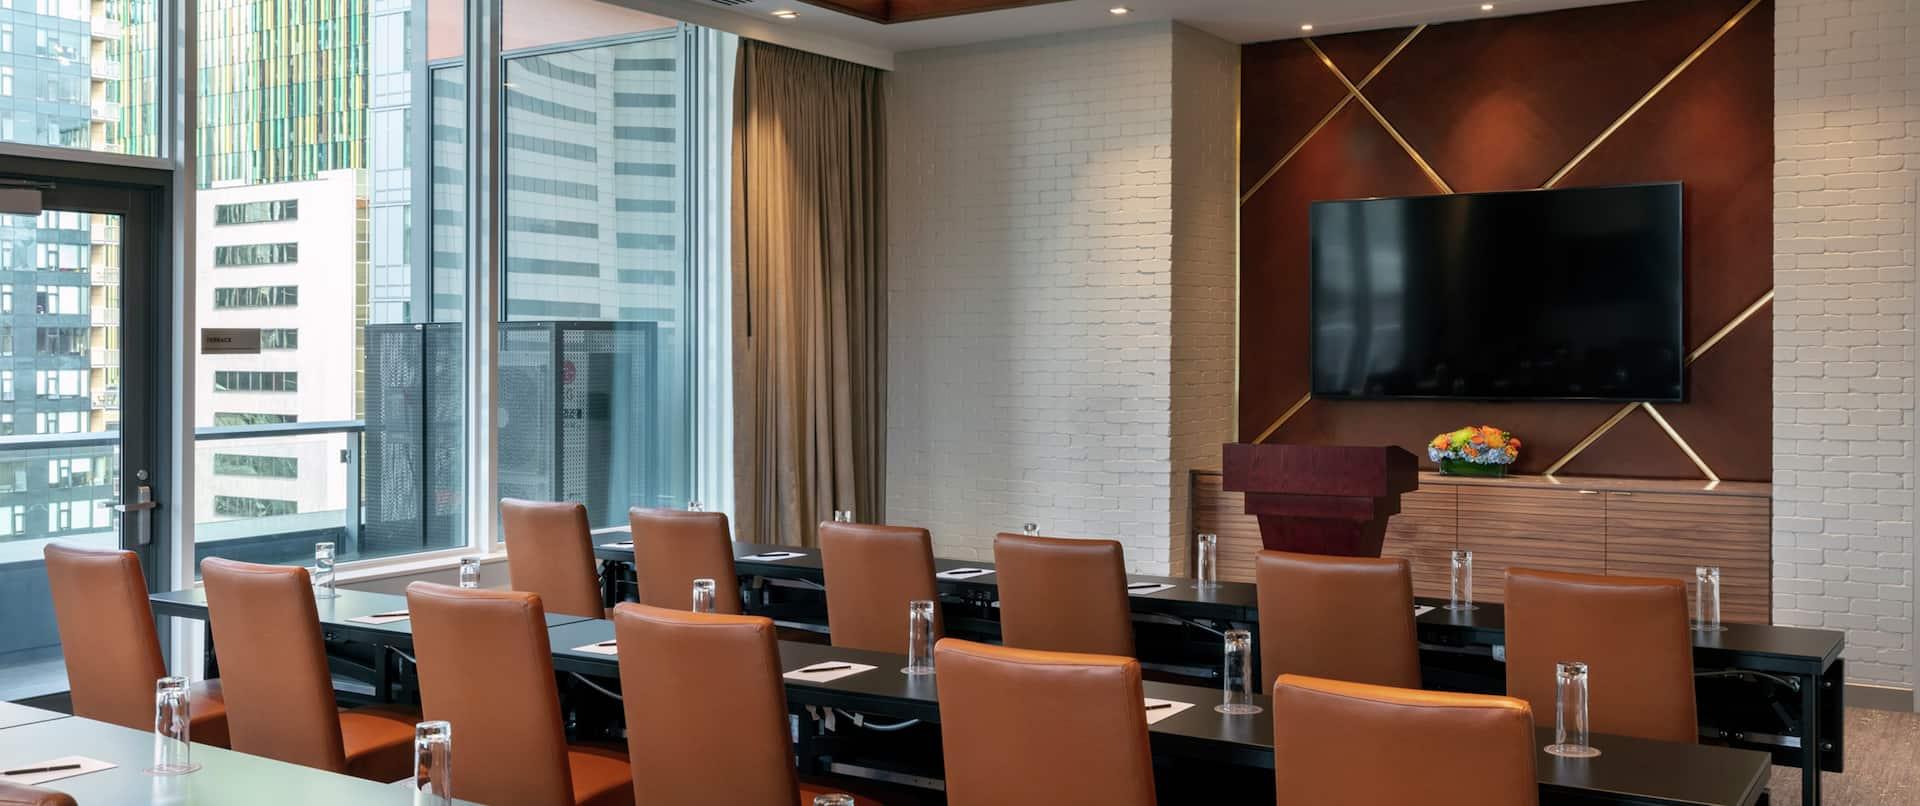 Lupine Meeting Room